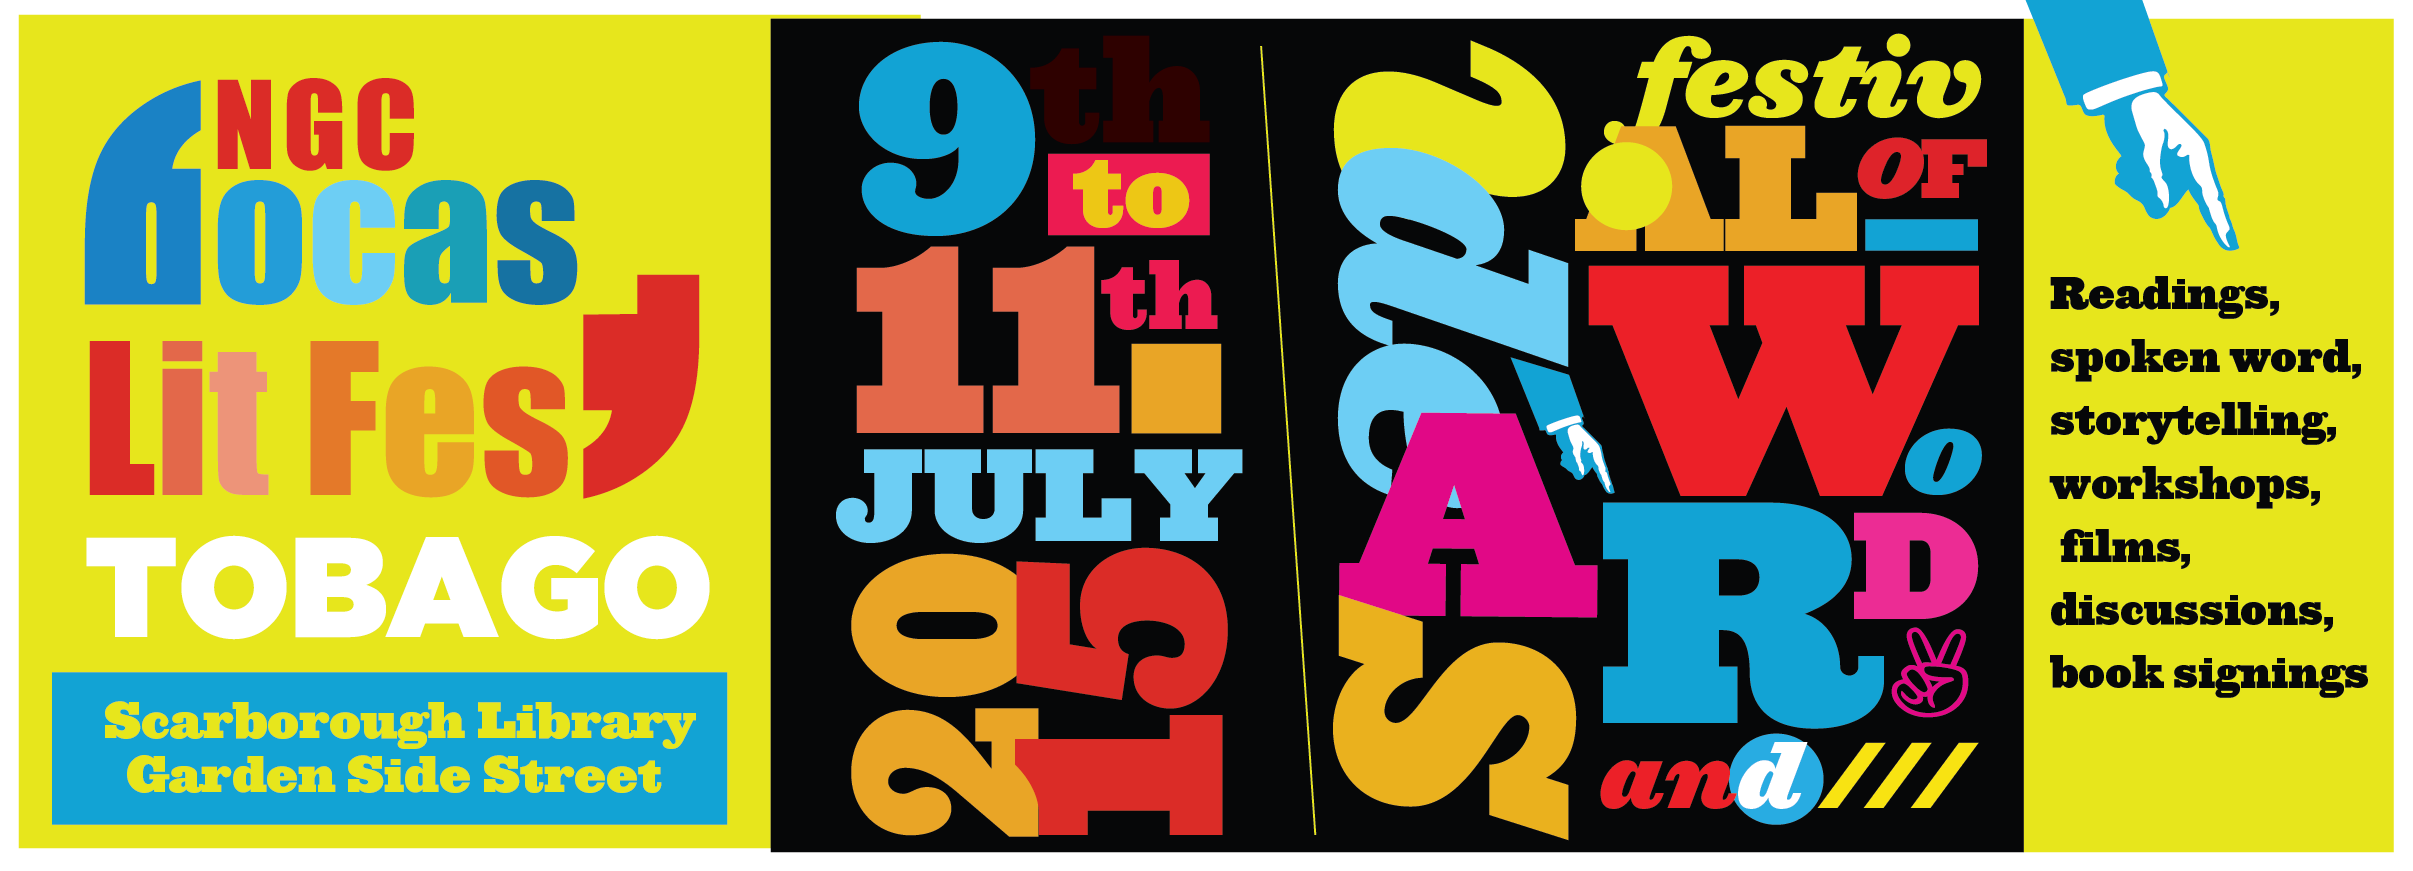 Tobago NGC Bocas Lit Fest Repeating Islands - Lit design 2015